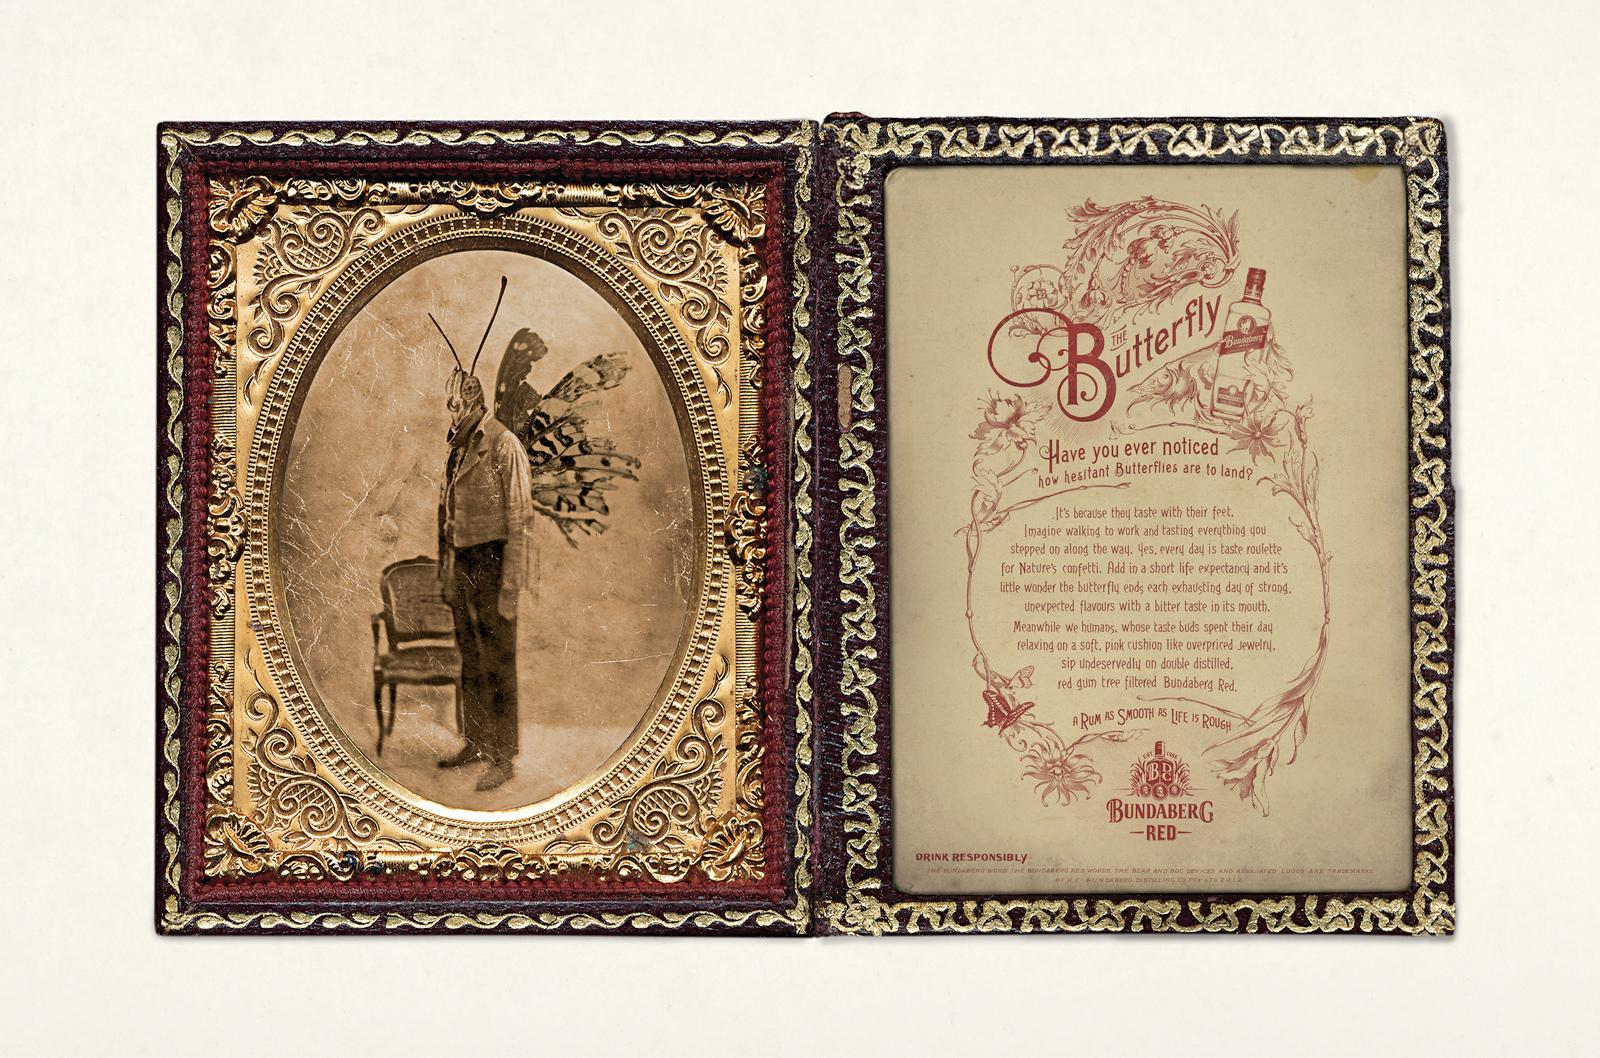 Bundaberg Print Ad -  Red Bundy Butterfly Award